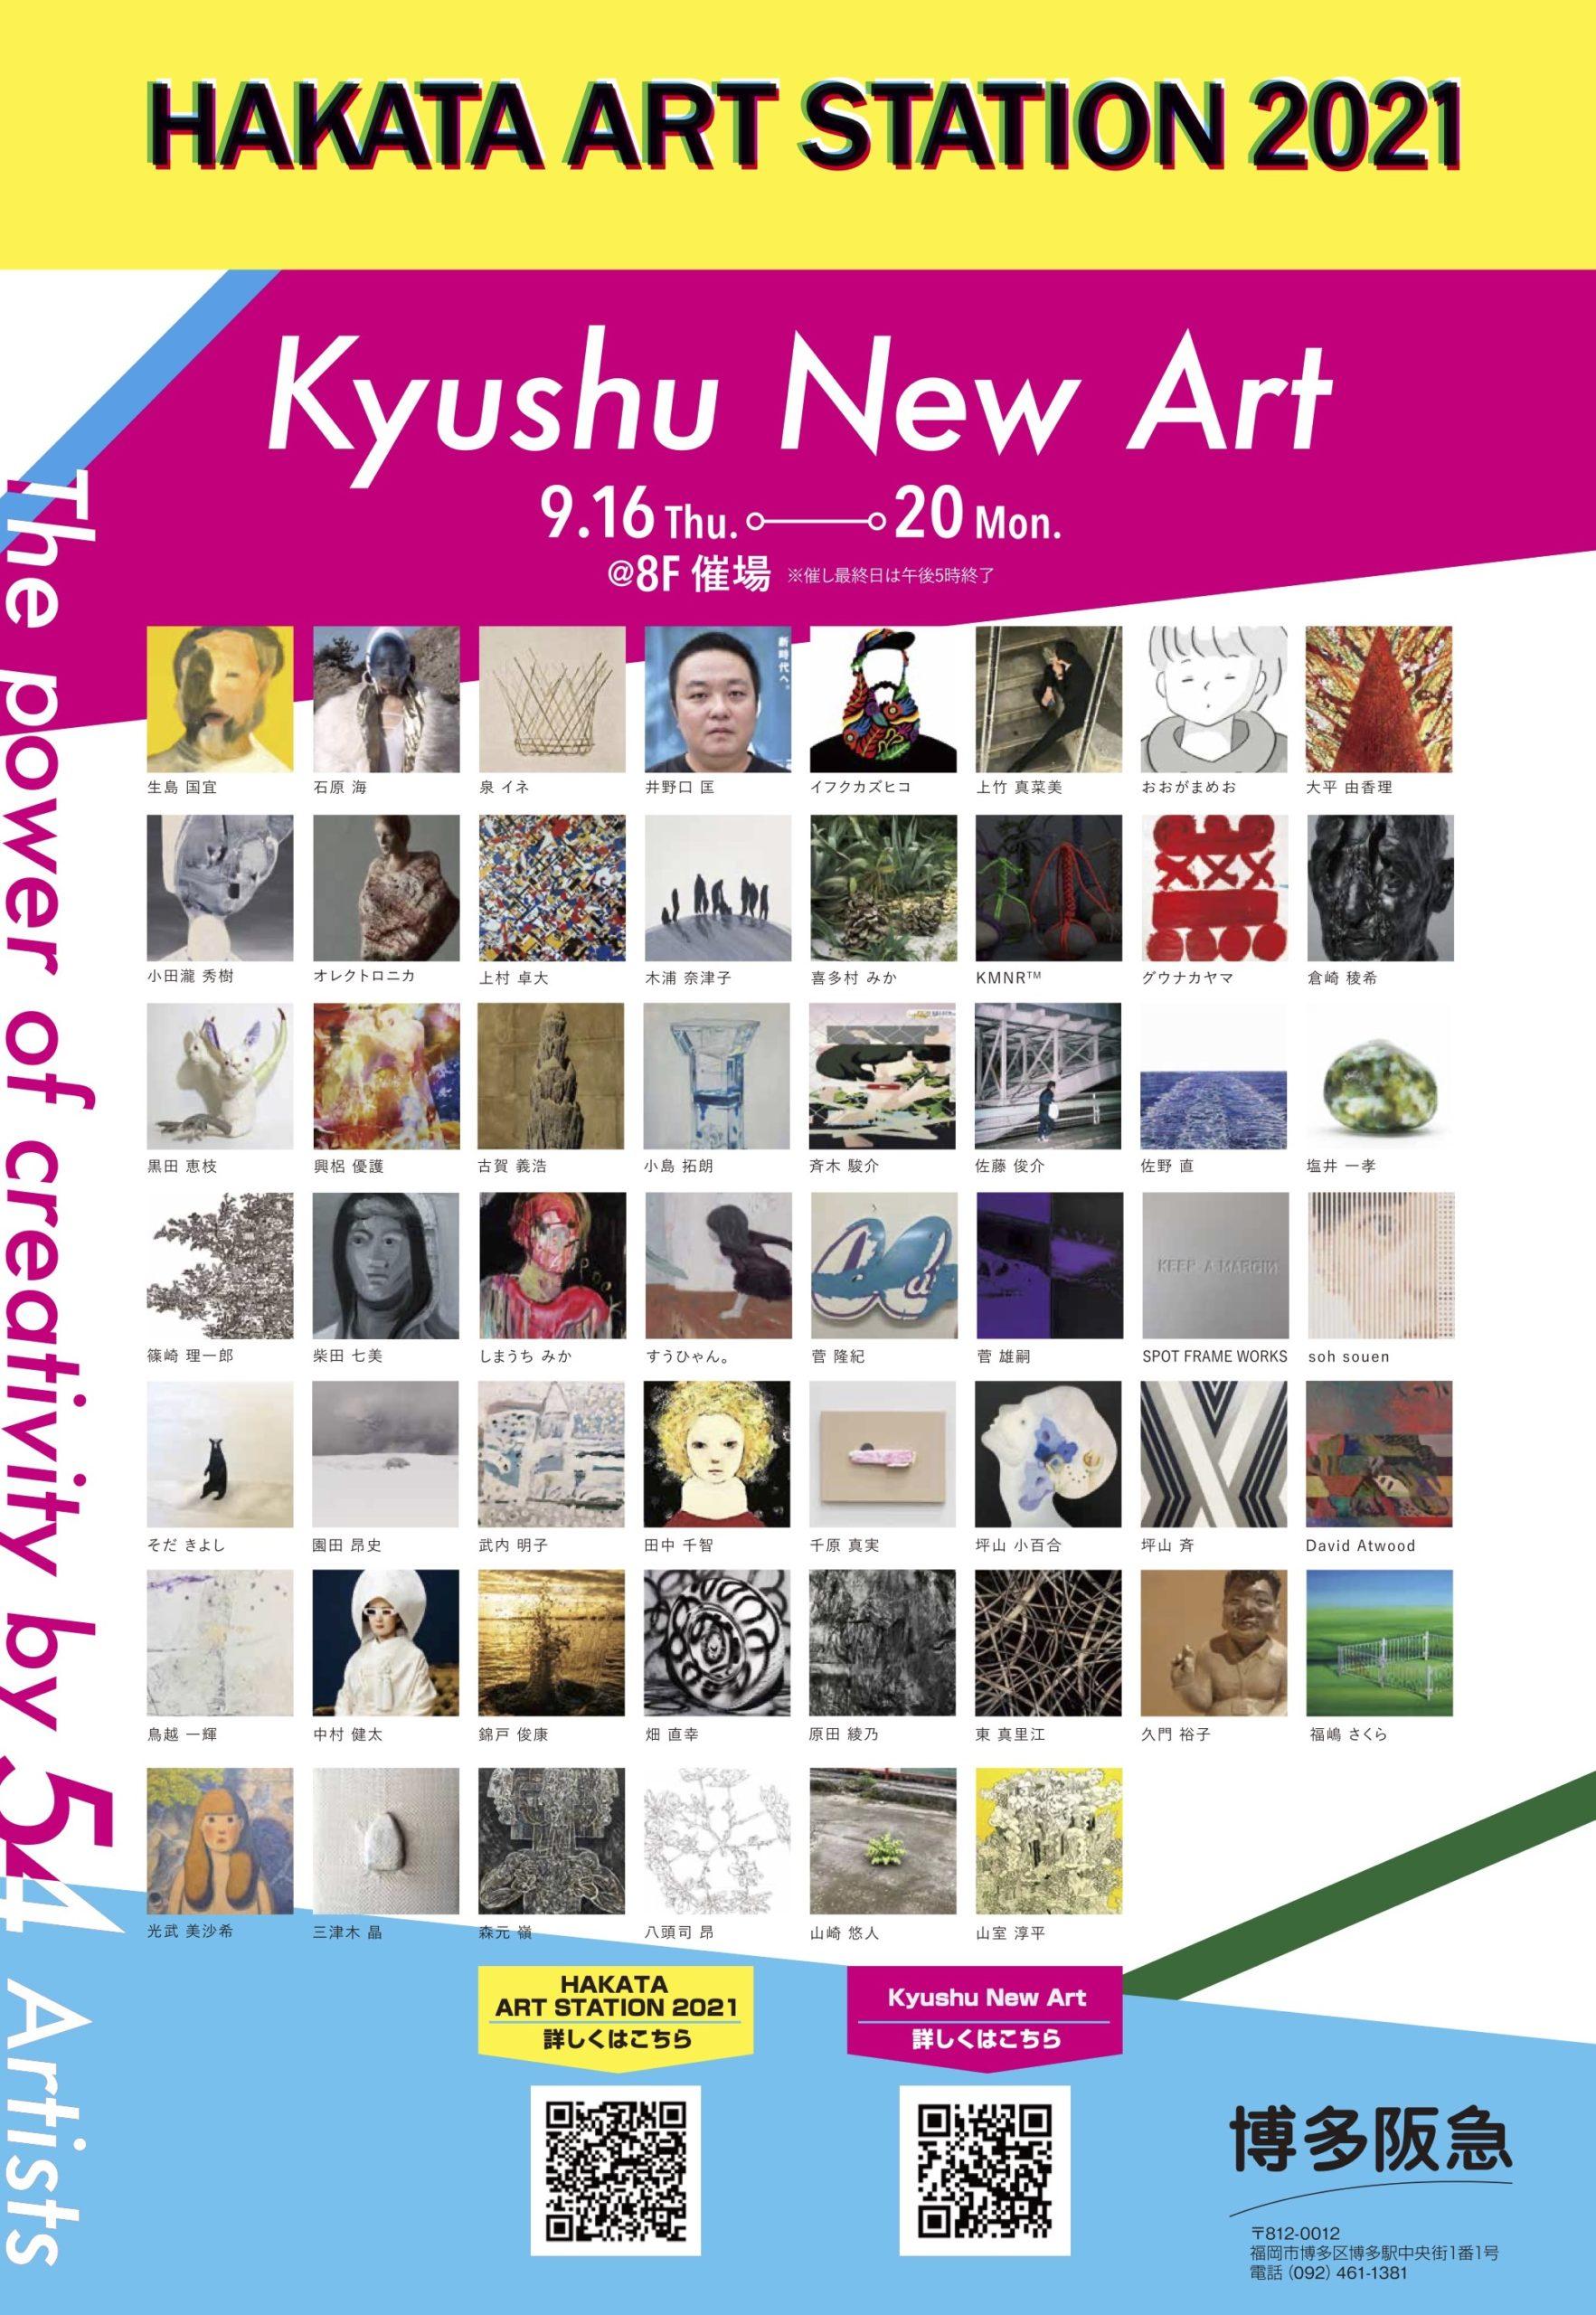 KyushuNewArt